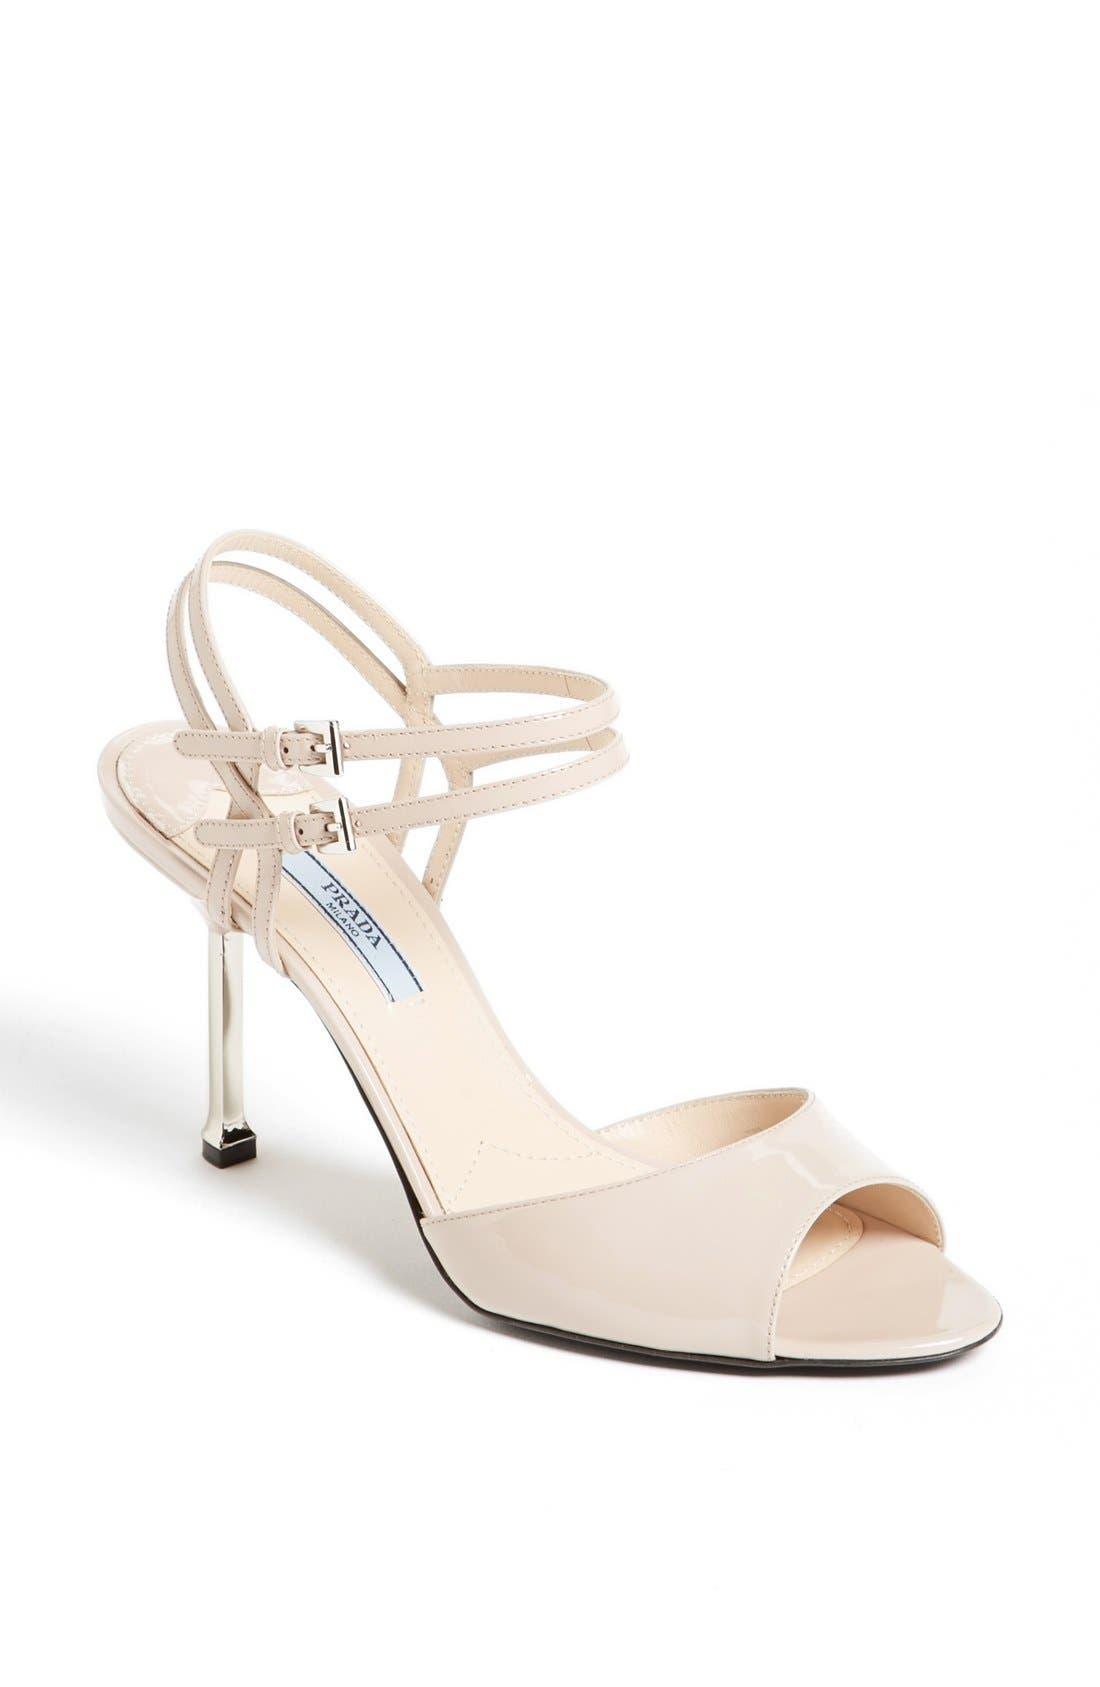 Main Image - Prada Double Ankle Buckle Metal Heel Sandal